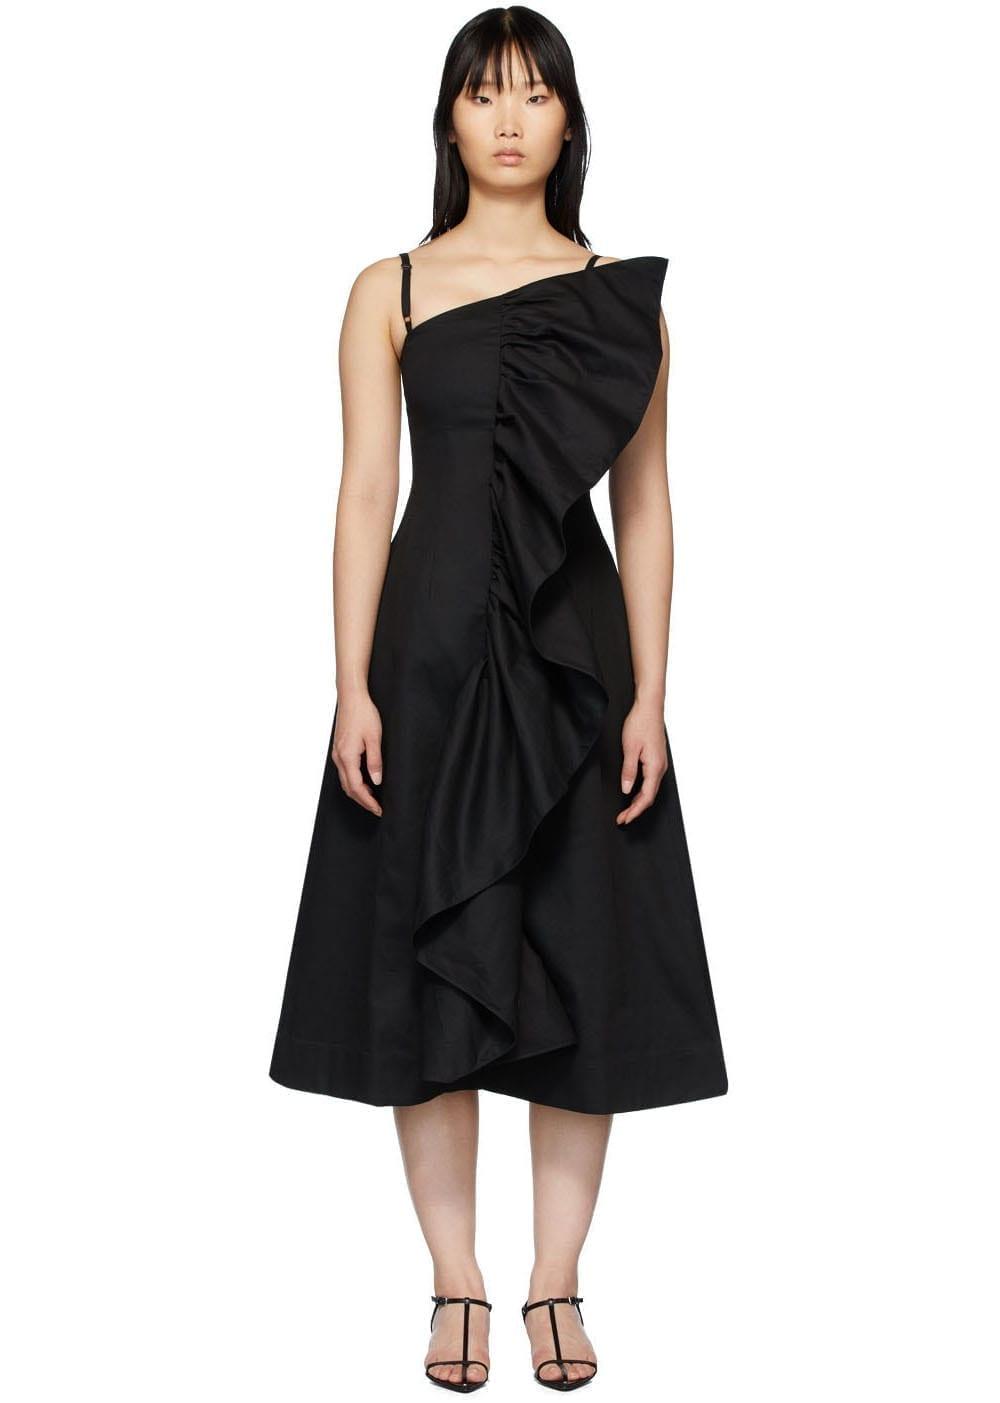 EDIT SSENSE Exclusive Black Tuck Frill Dress